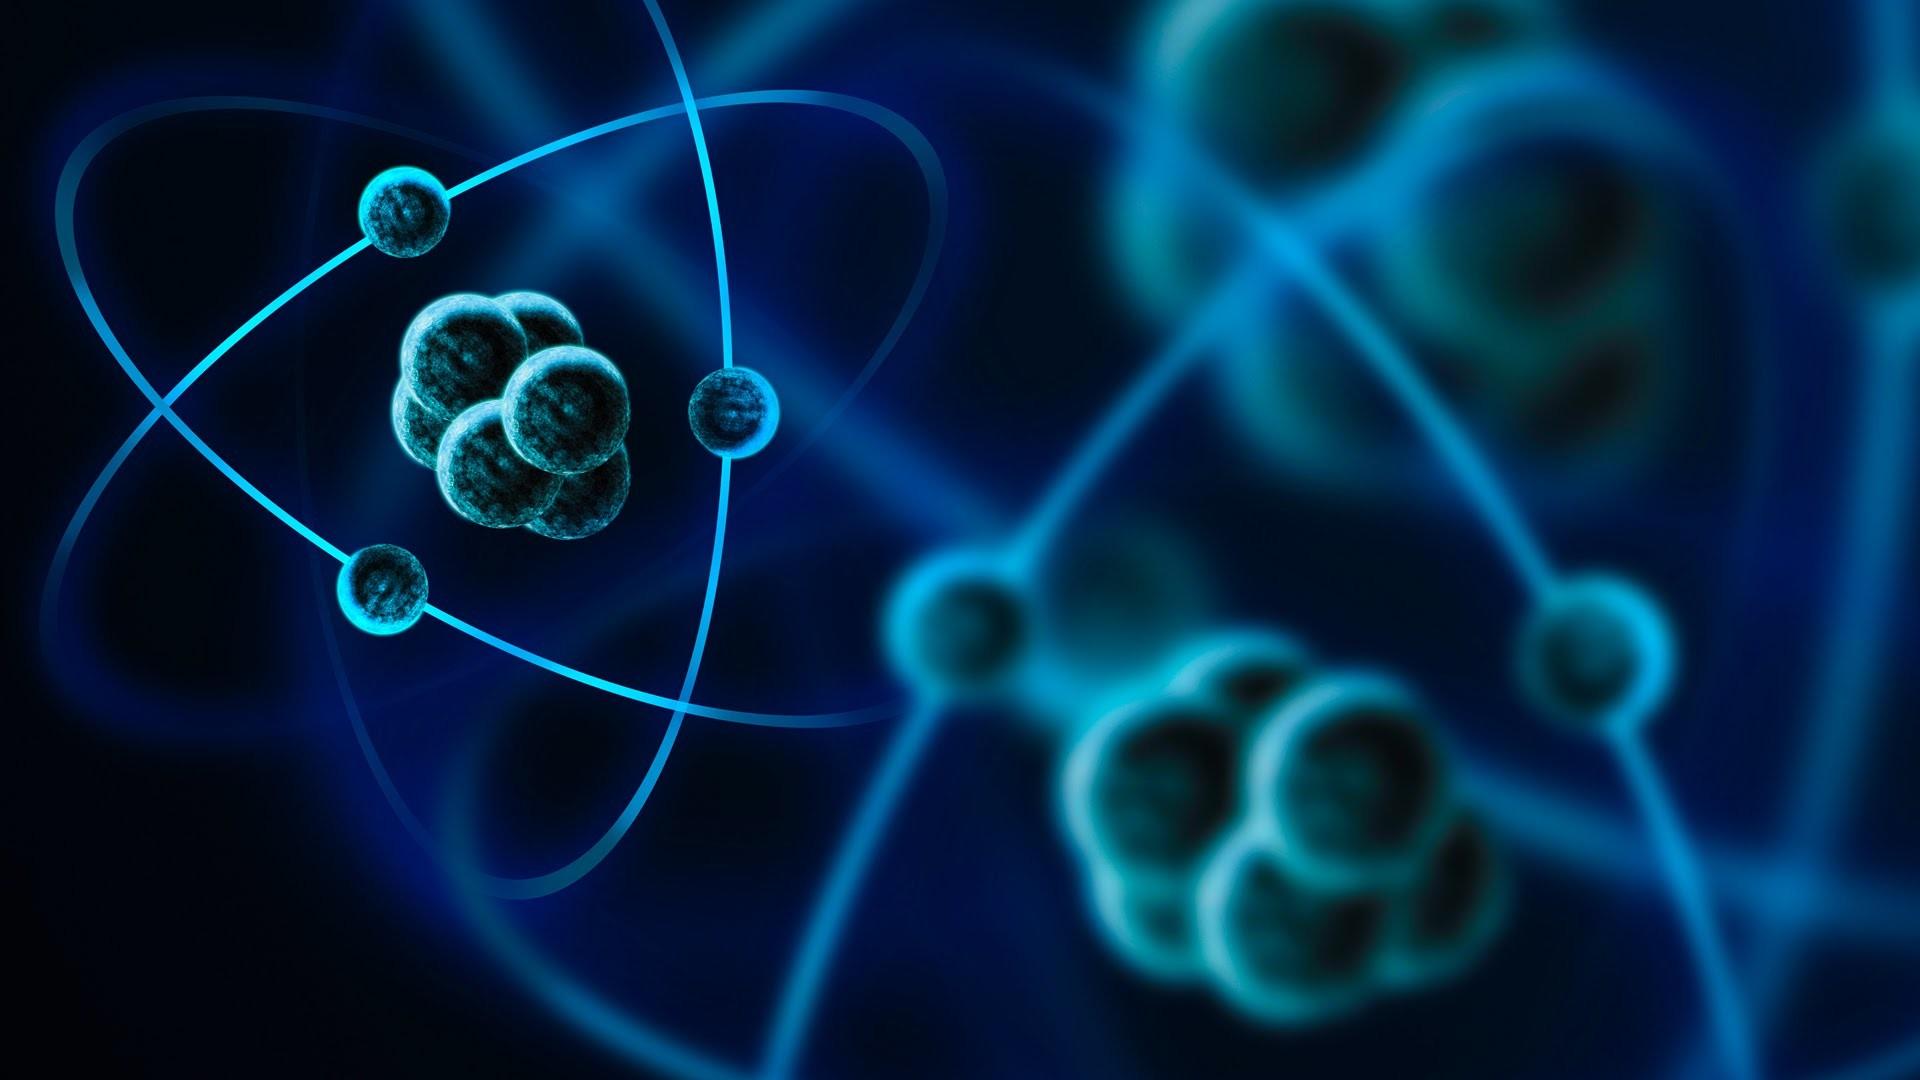 فیزیک کوانتومی در خدمت بازاریابی: تفکر کاتالیزوری و کلایدسکوپی